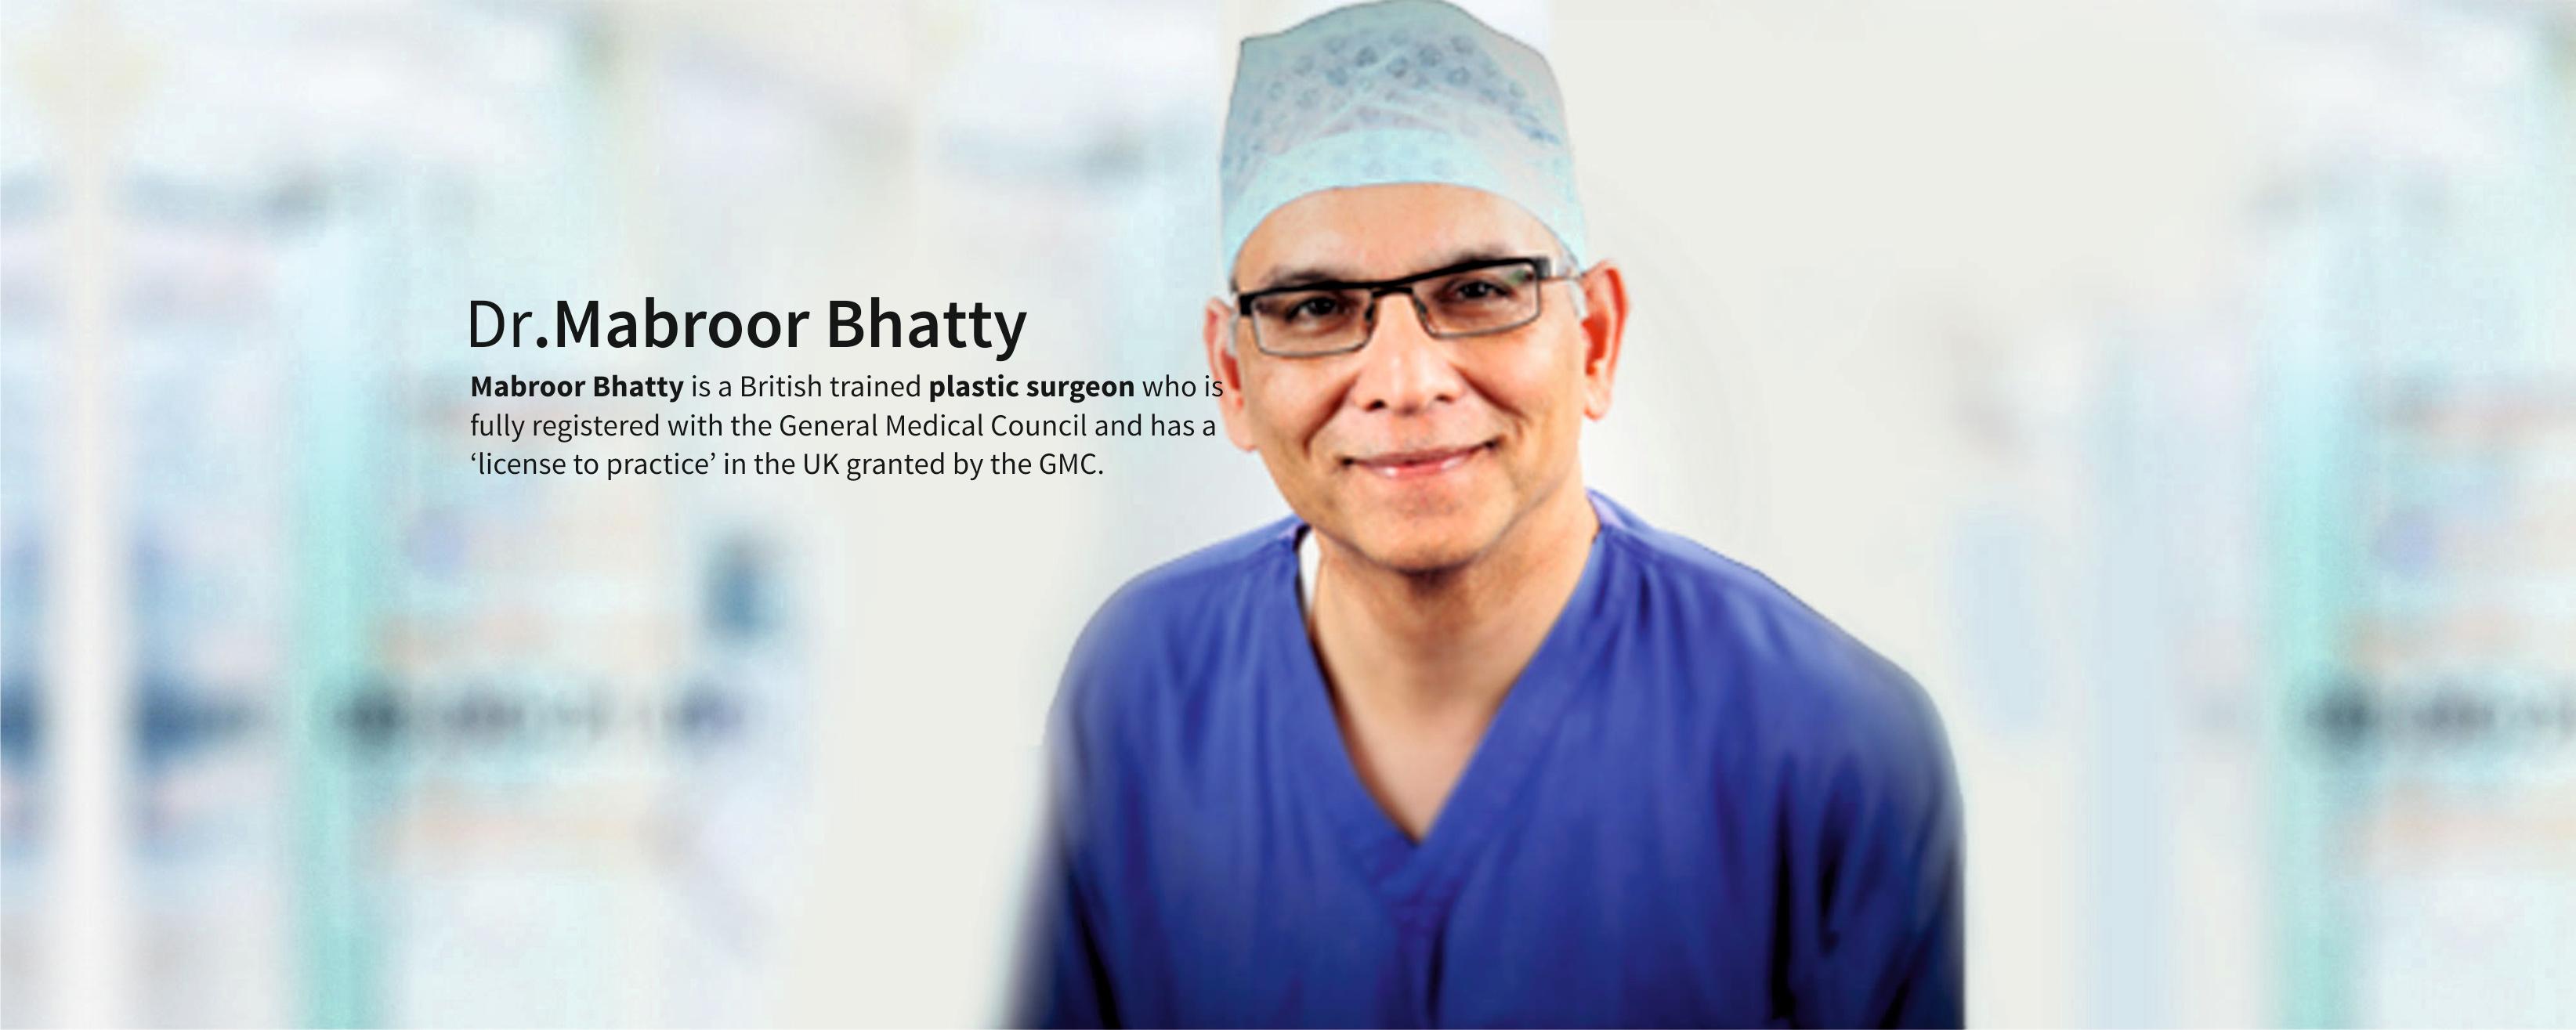 Mabroor Bhatty - Plastic Surgeon